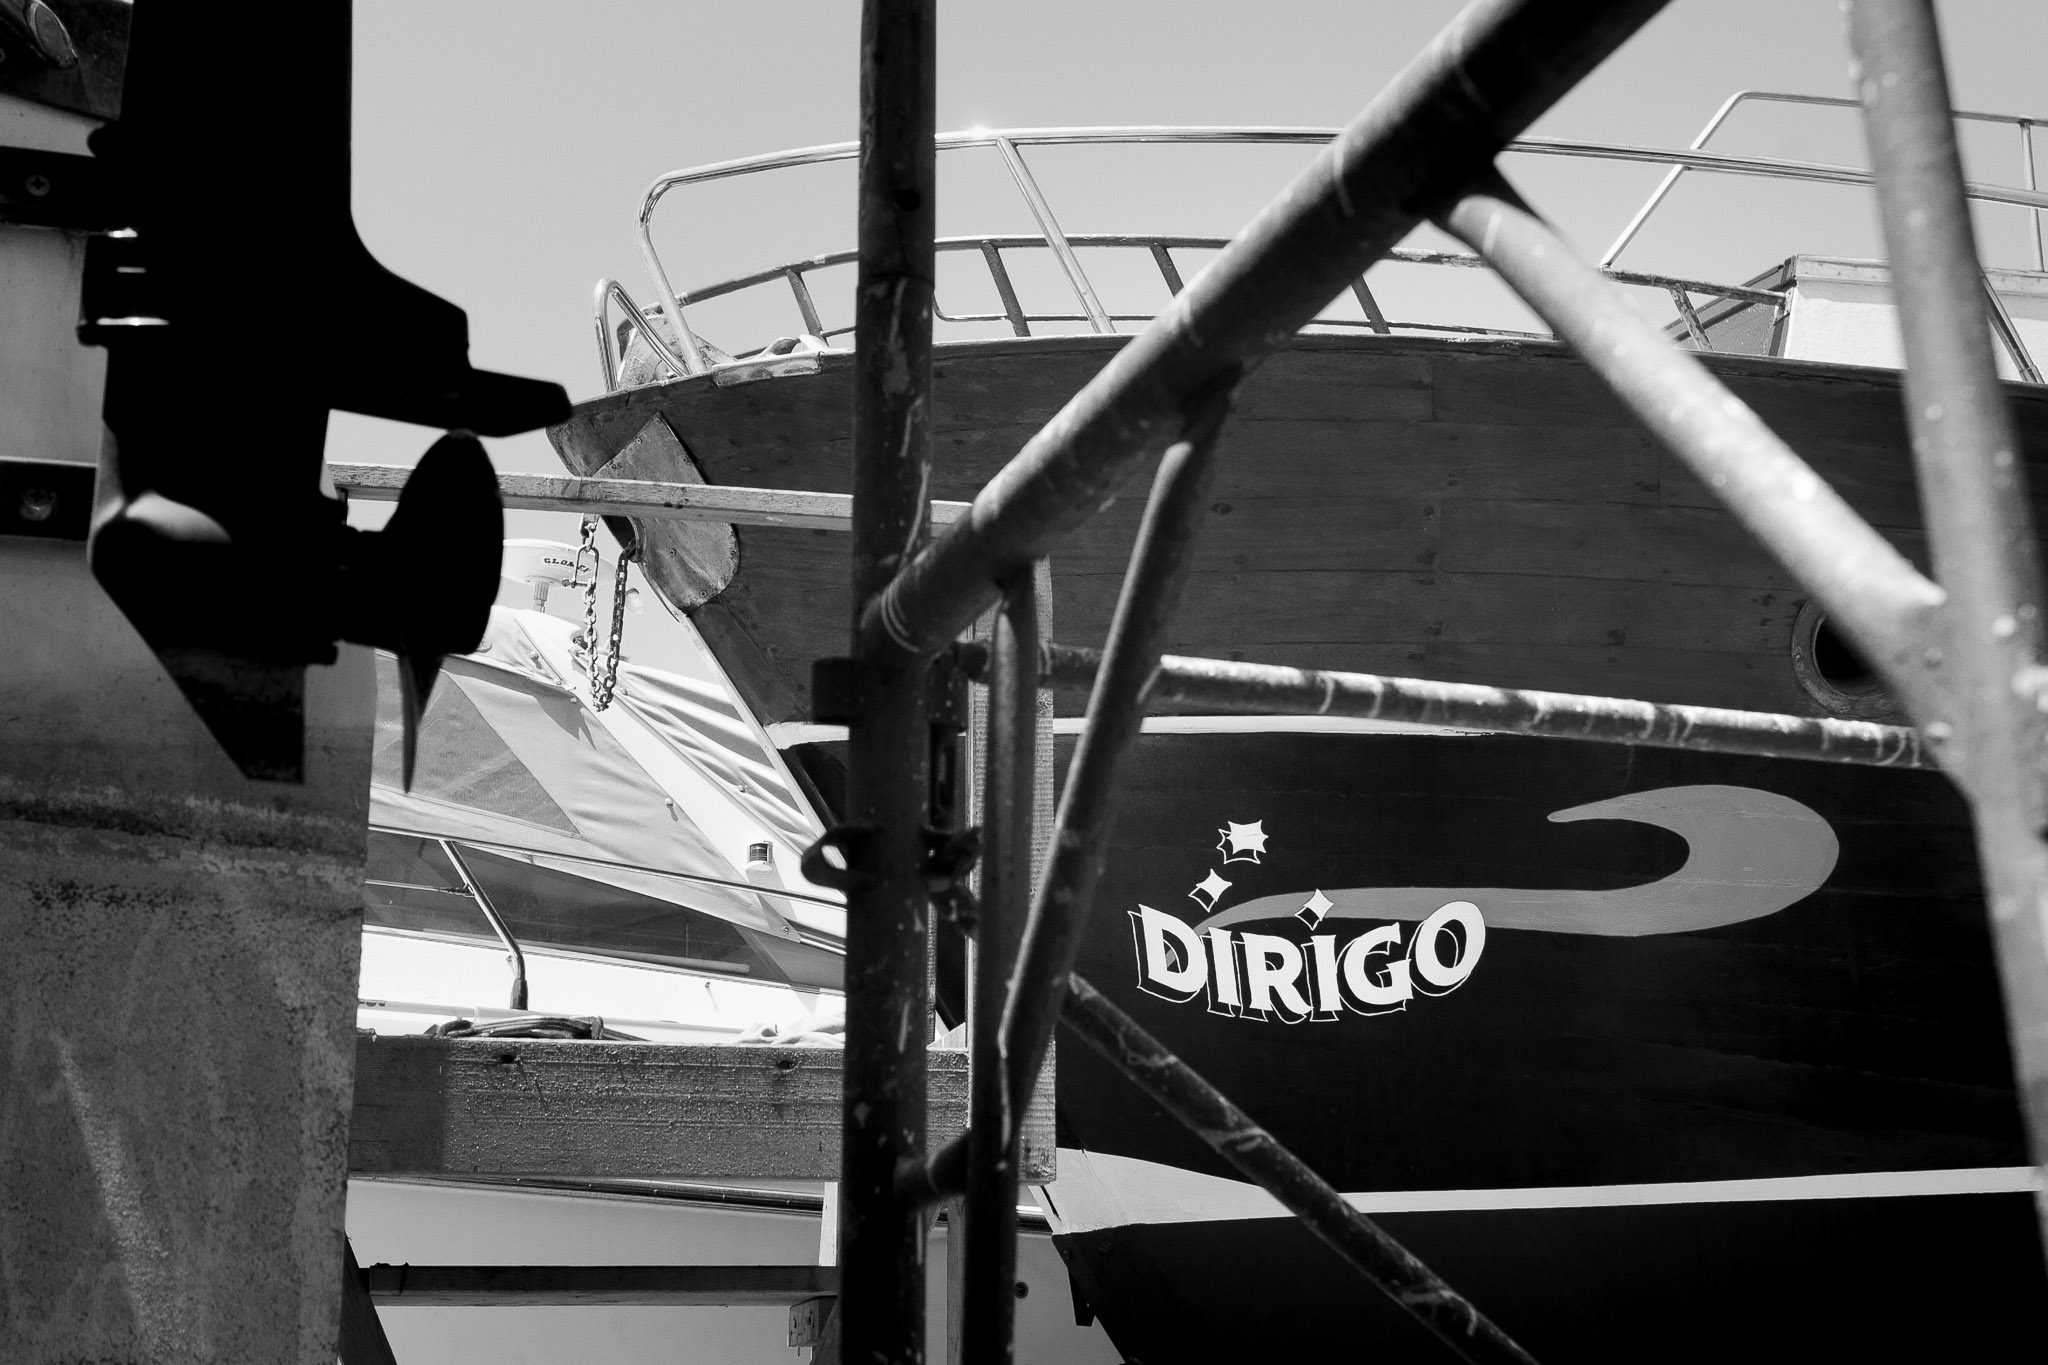 Dirigo Horizon hand painted logo on boats